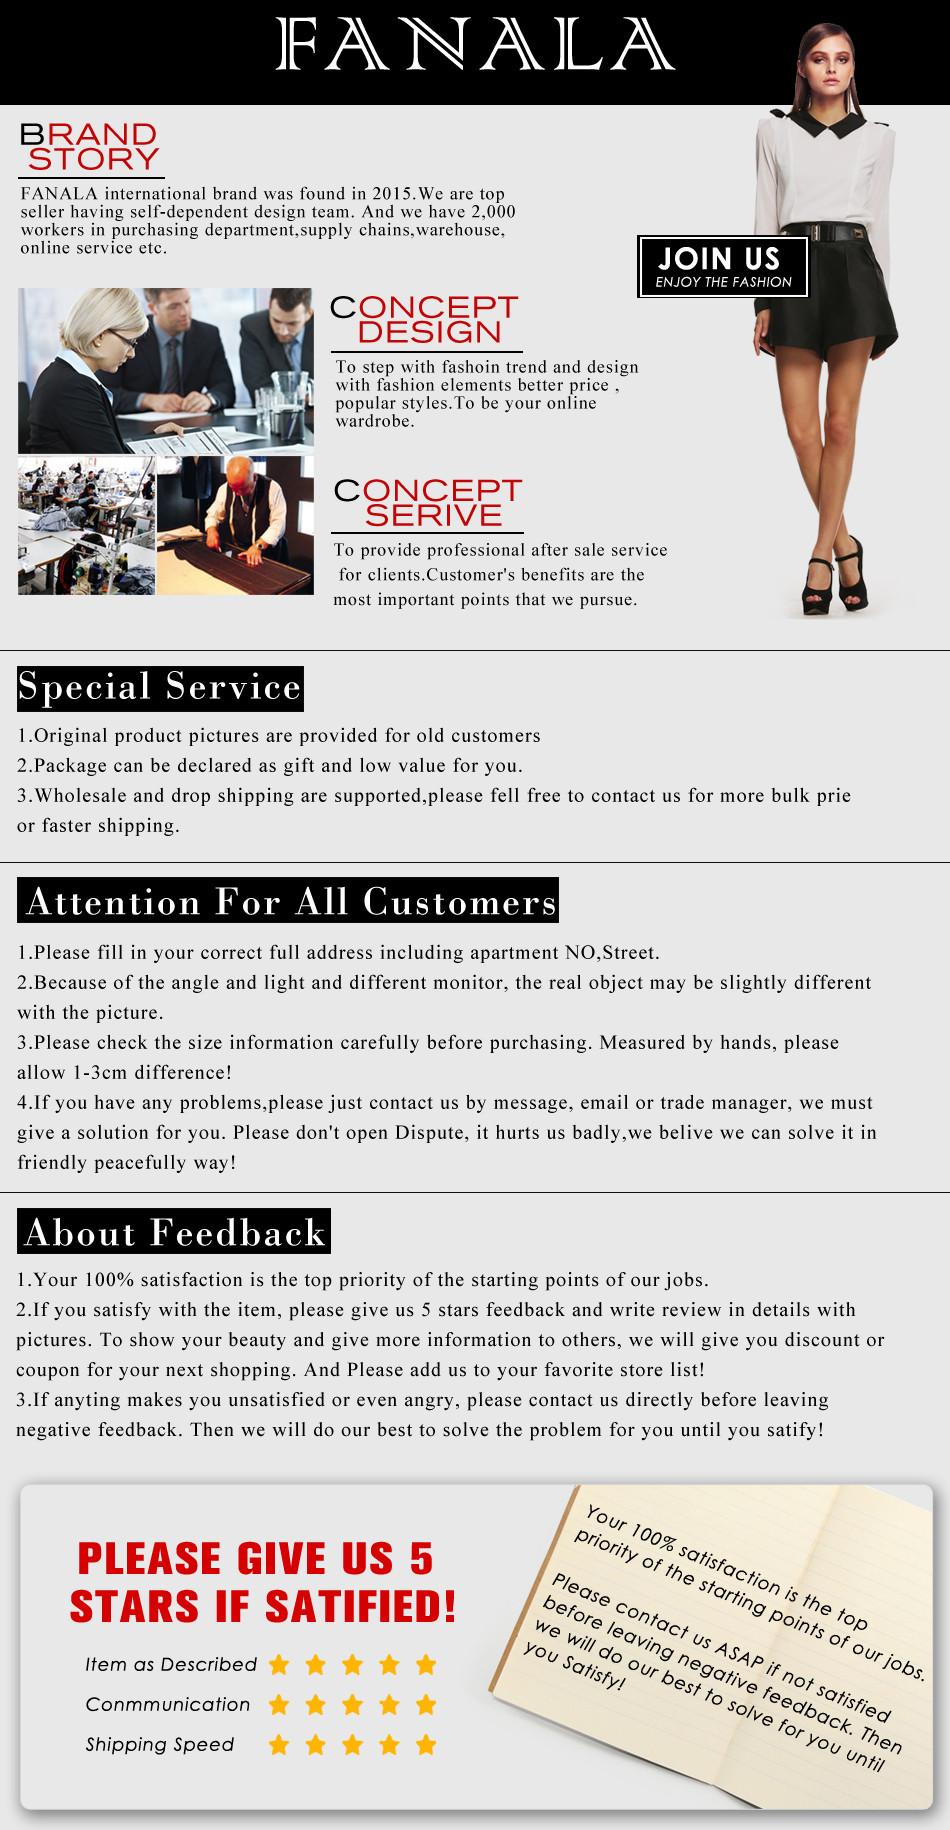 FANALA Brand Service